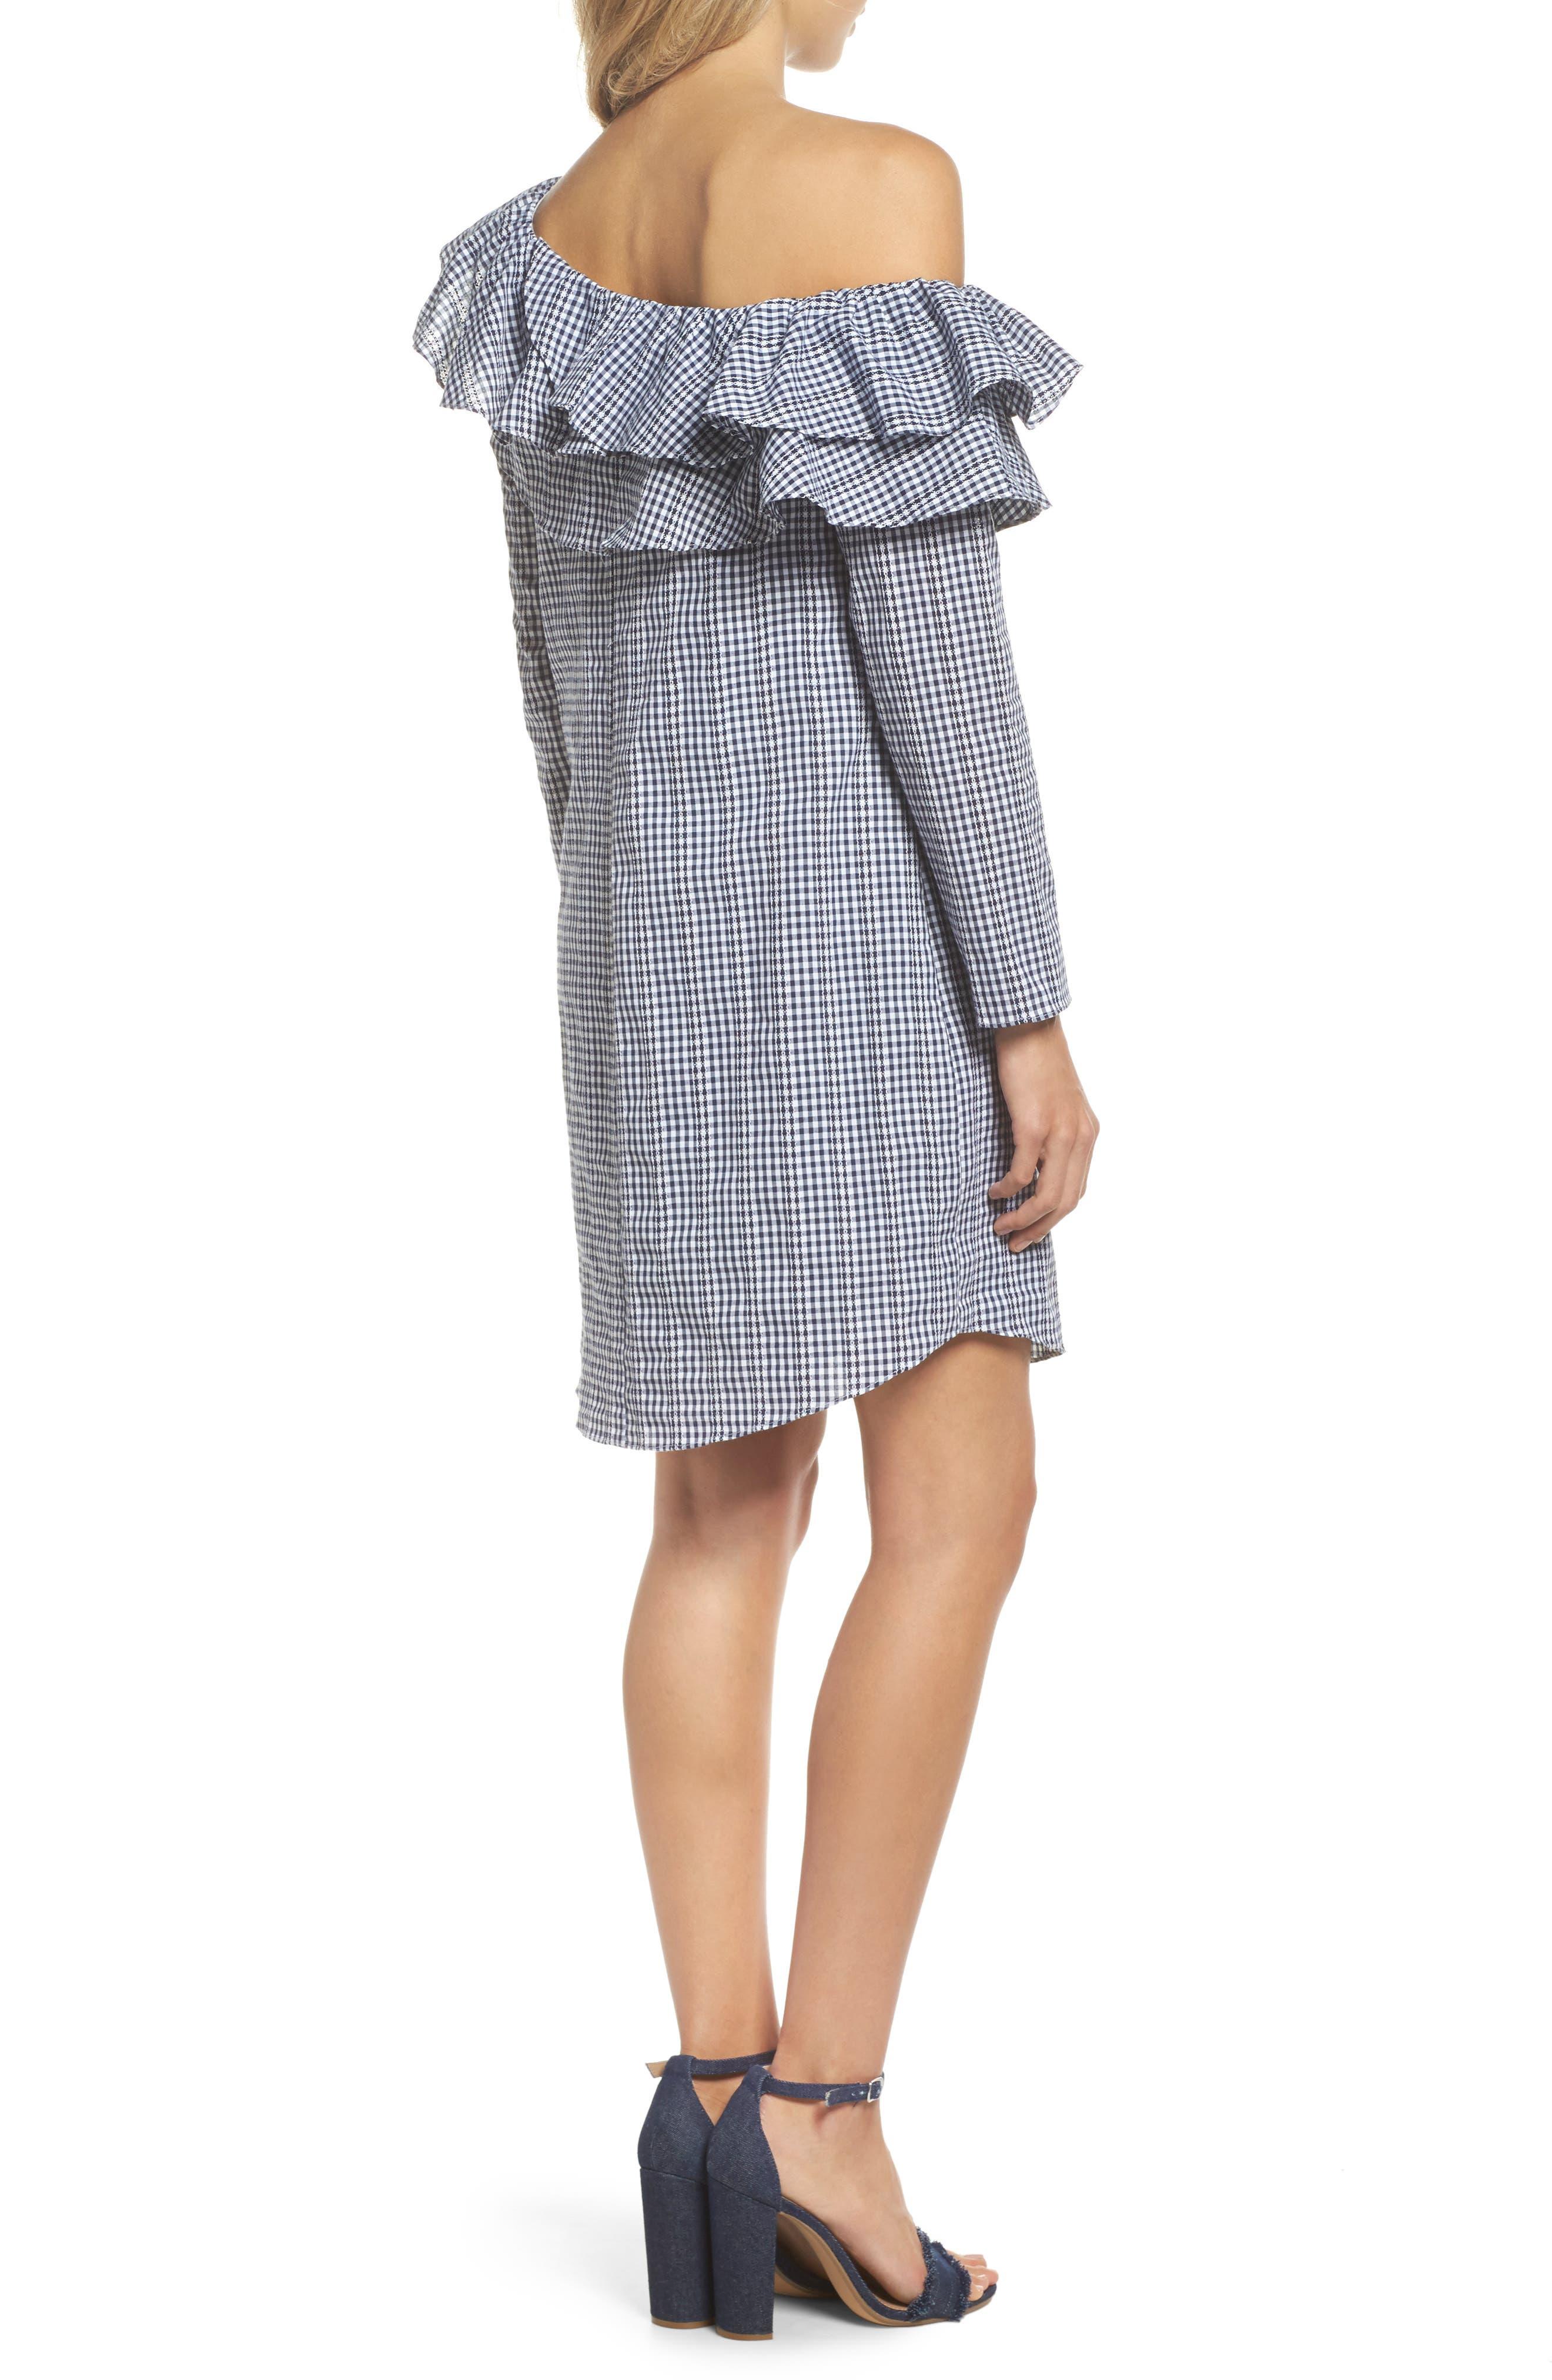 ADELYN RAE,                             Gingham One-Shoulder Ruffle Dress,                             Alternate thumbnail 2, color,                             410